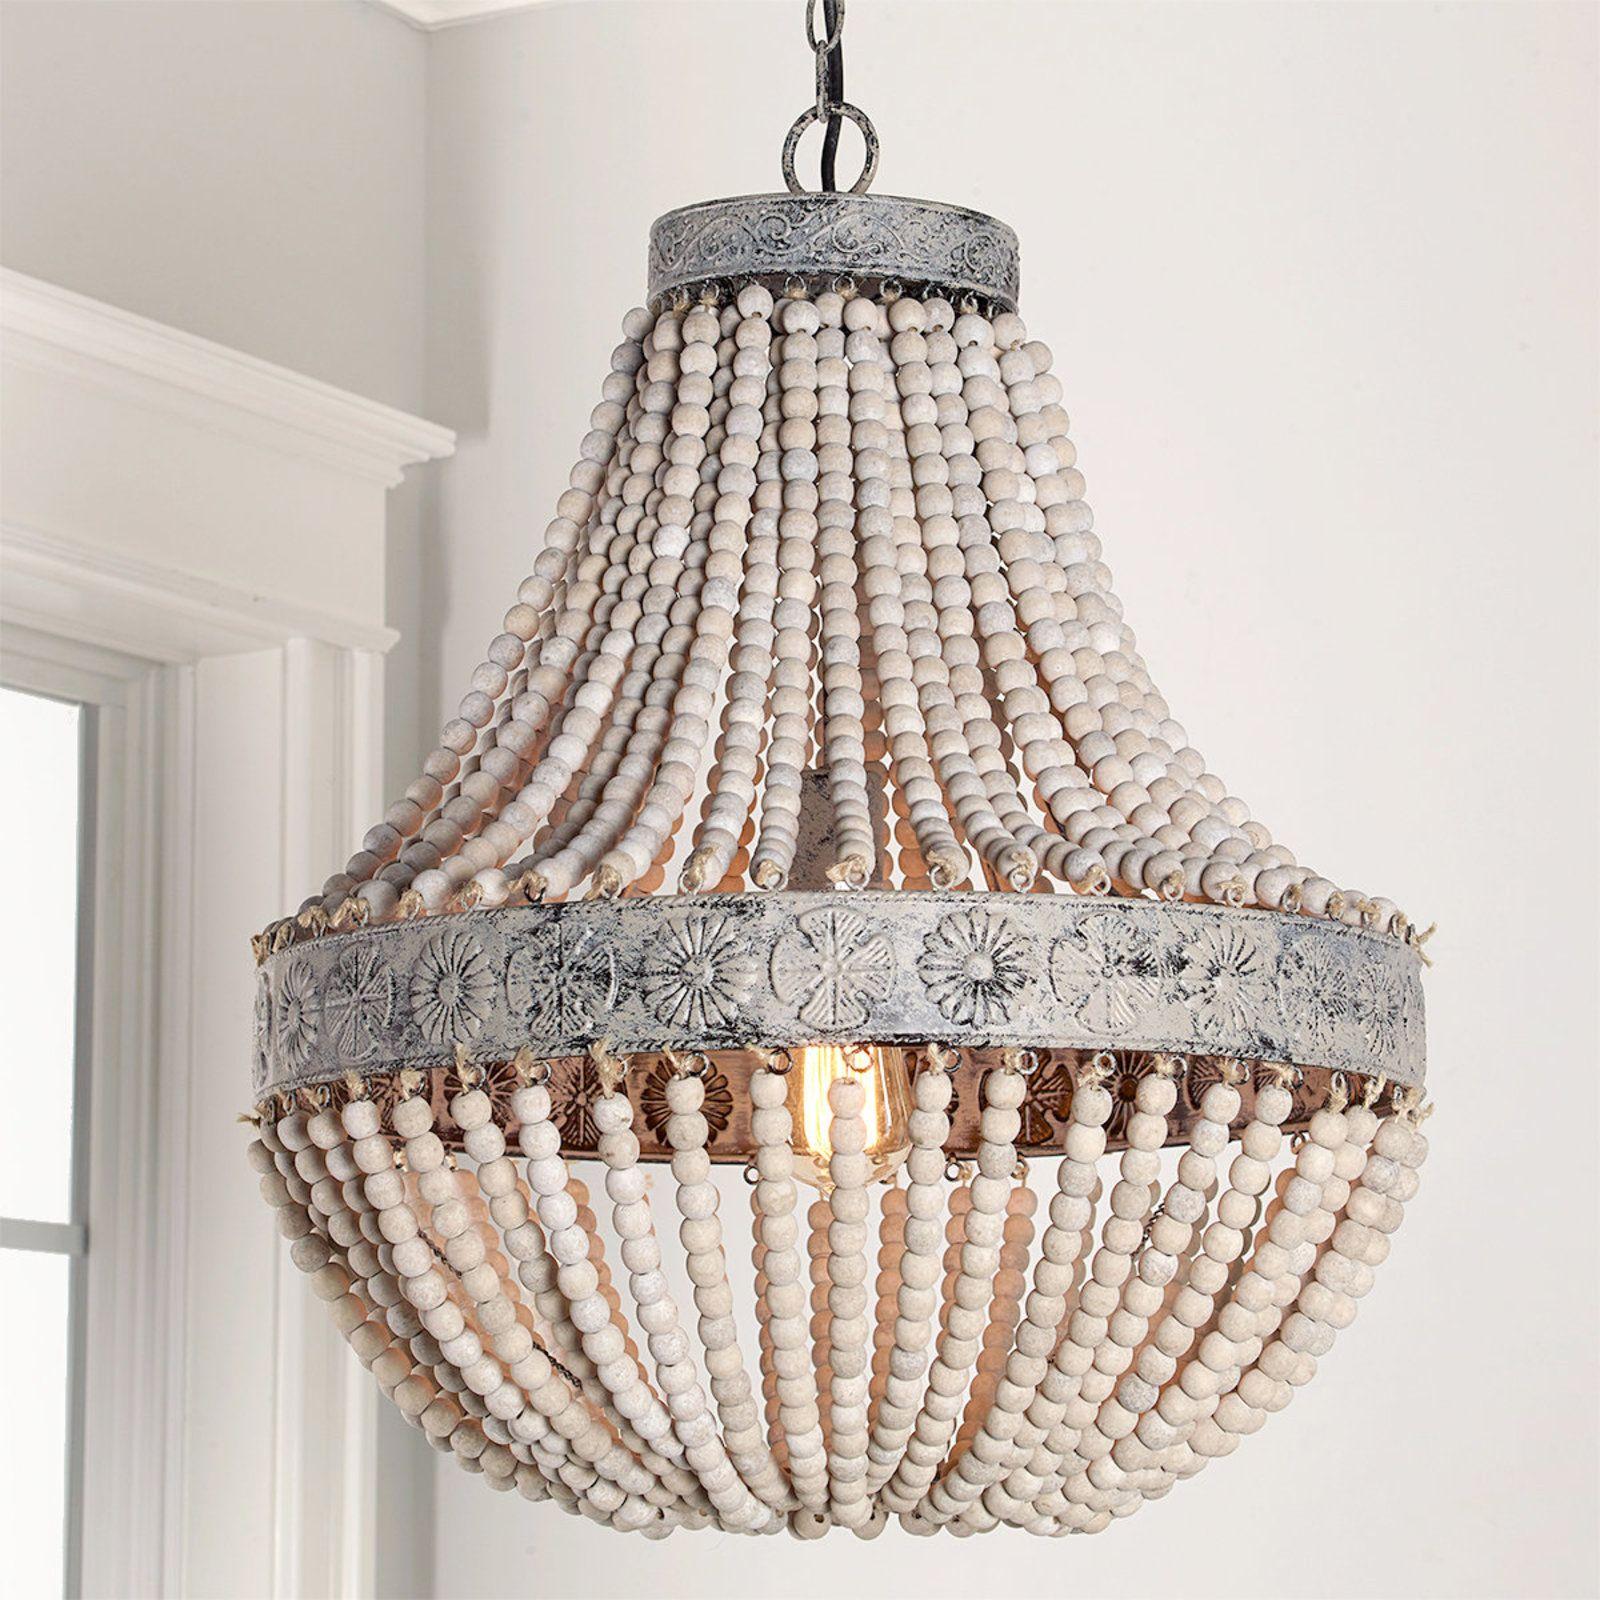 Aged wood beaded chandelier wood bead chandelier aged wood and aged wood beaded chandelier arubaitofo Gallery